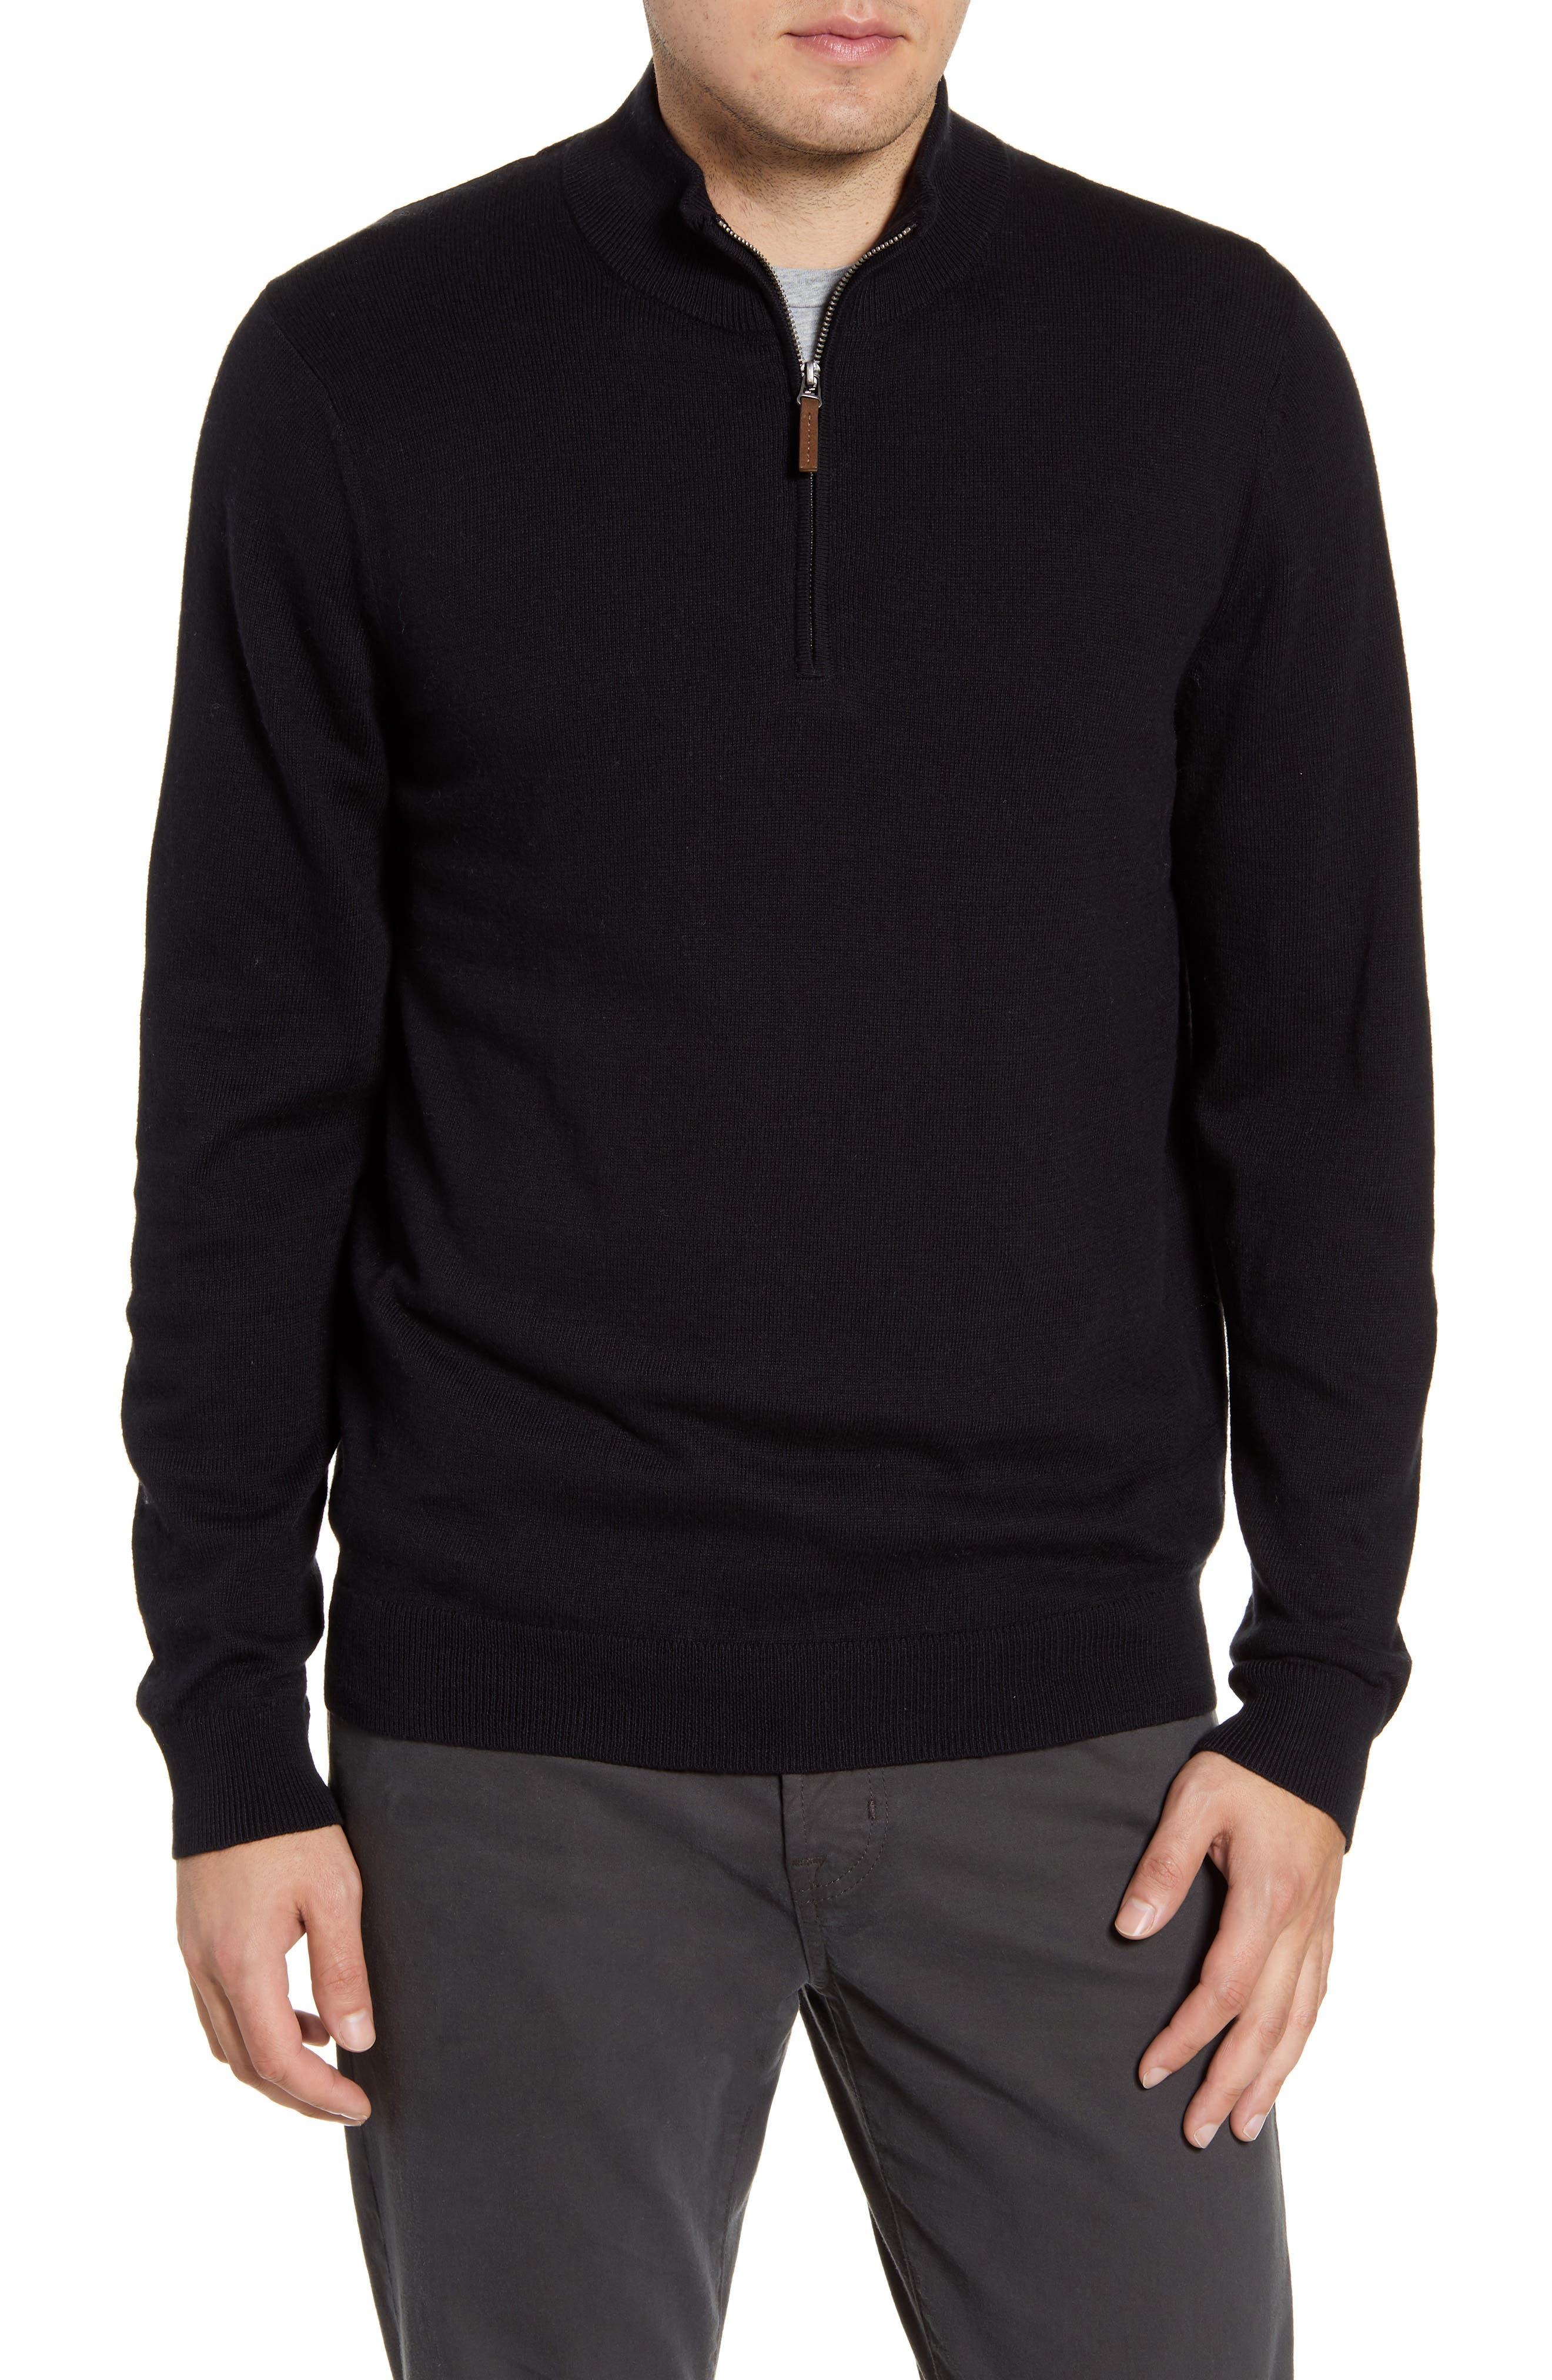 6e0d79e80e2 Men's Big & Tall Sweaters, Cardigans, Fleece | Nordstrom